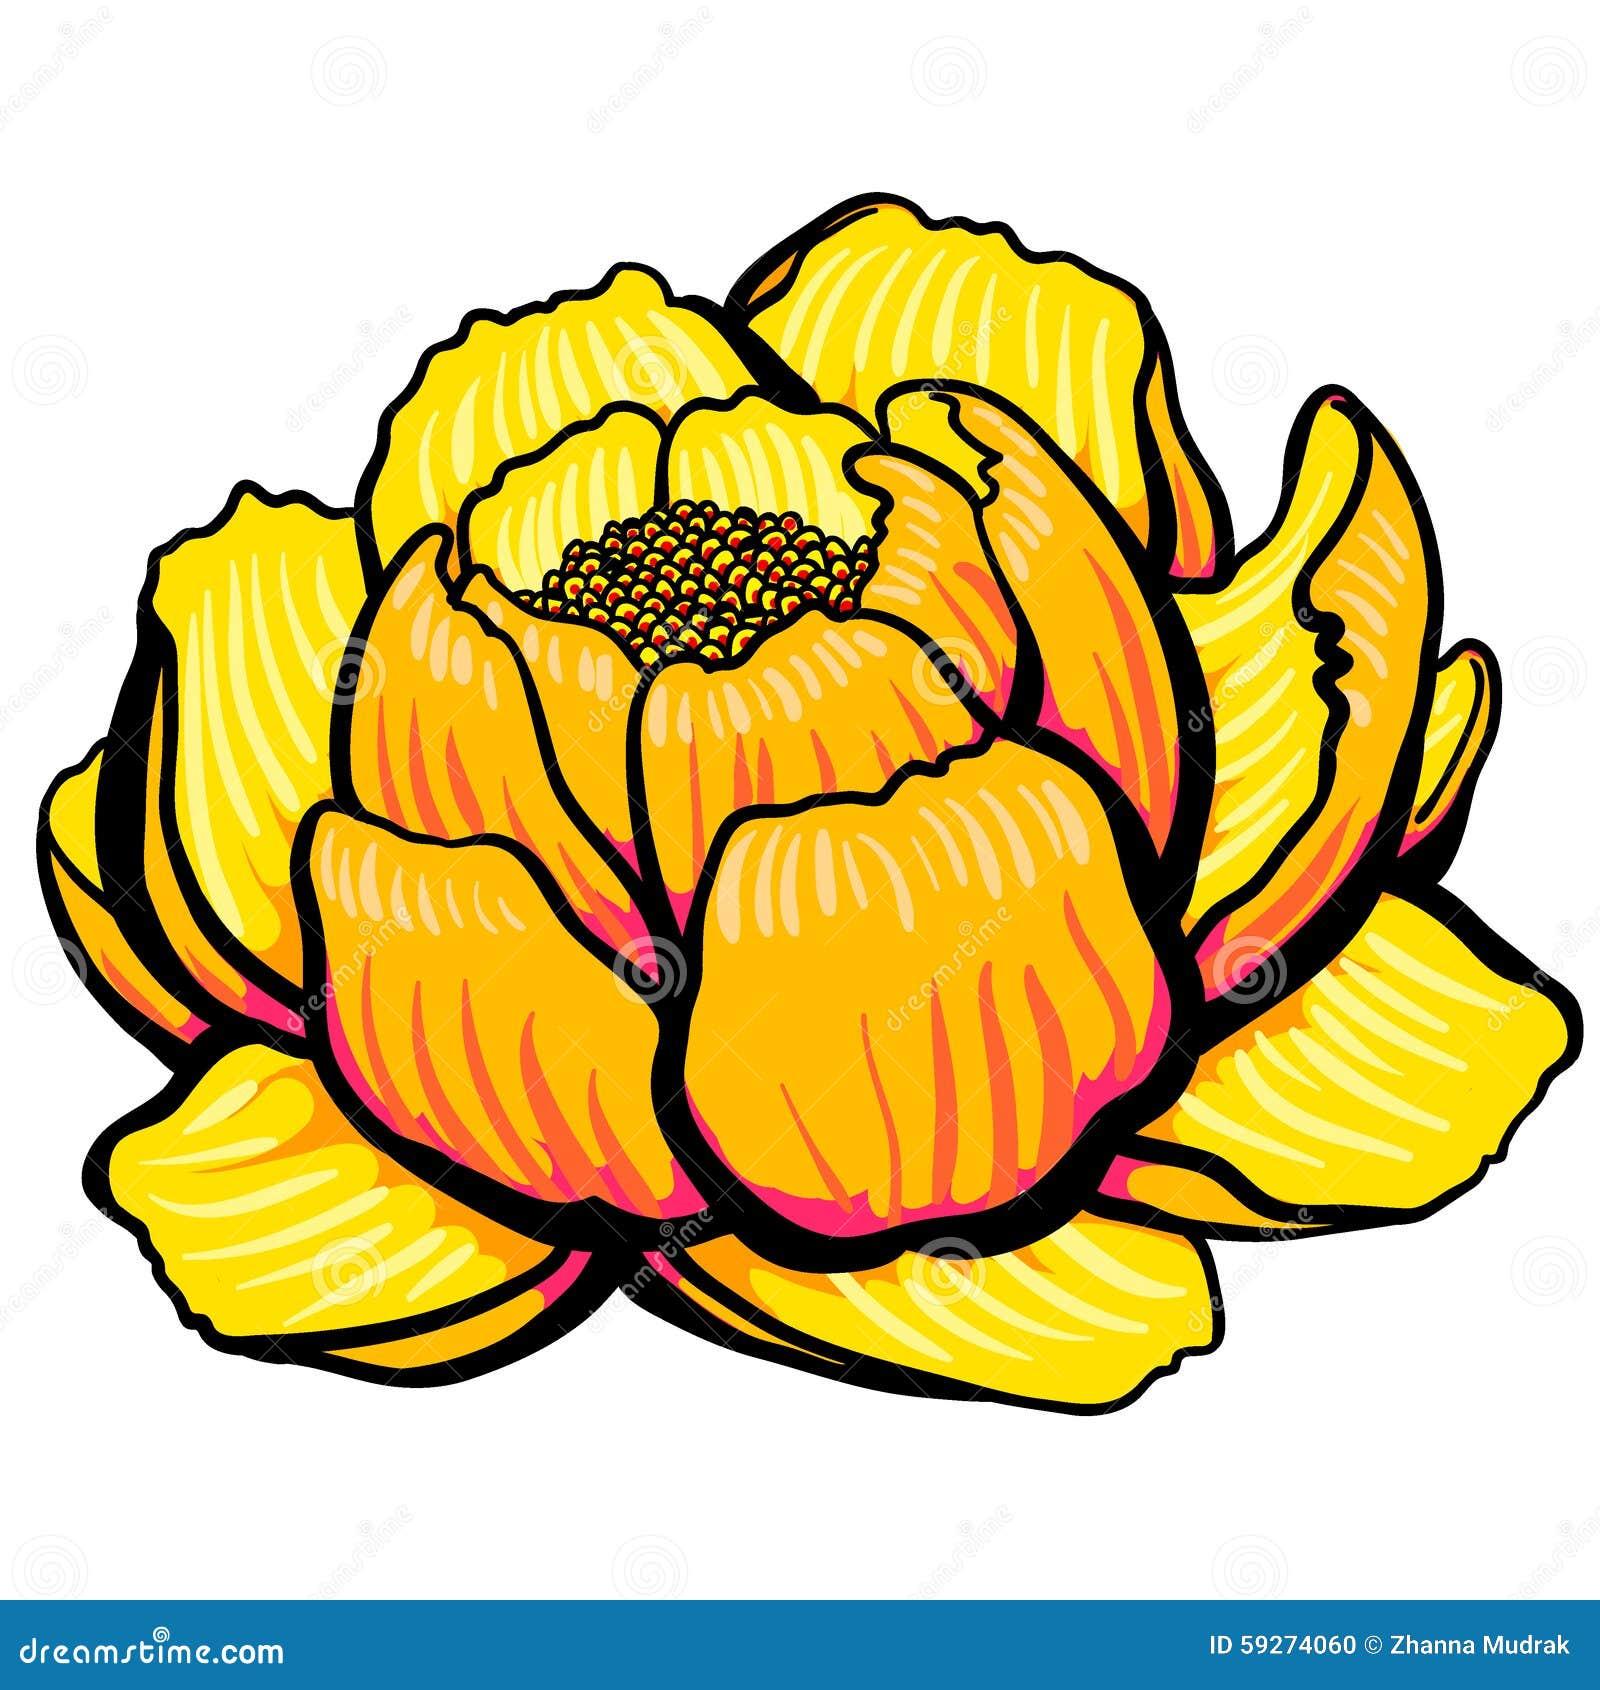 Cartoon yellow lily flower open stock illustration illustration of cartoon yellow lily flower open izmirmasajfo